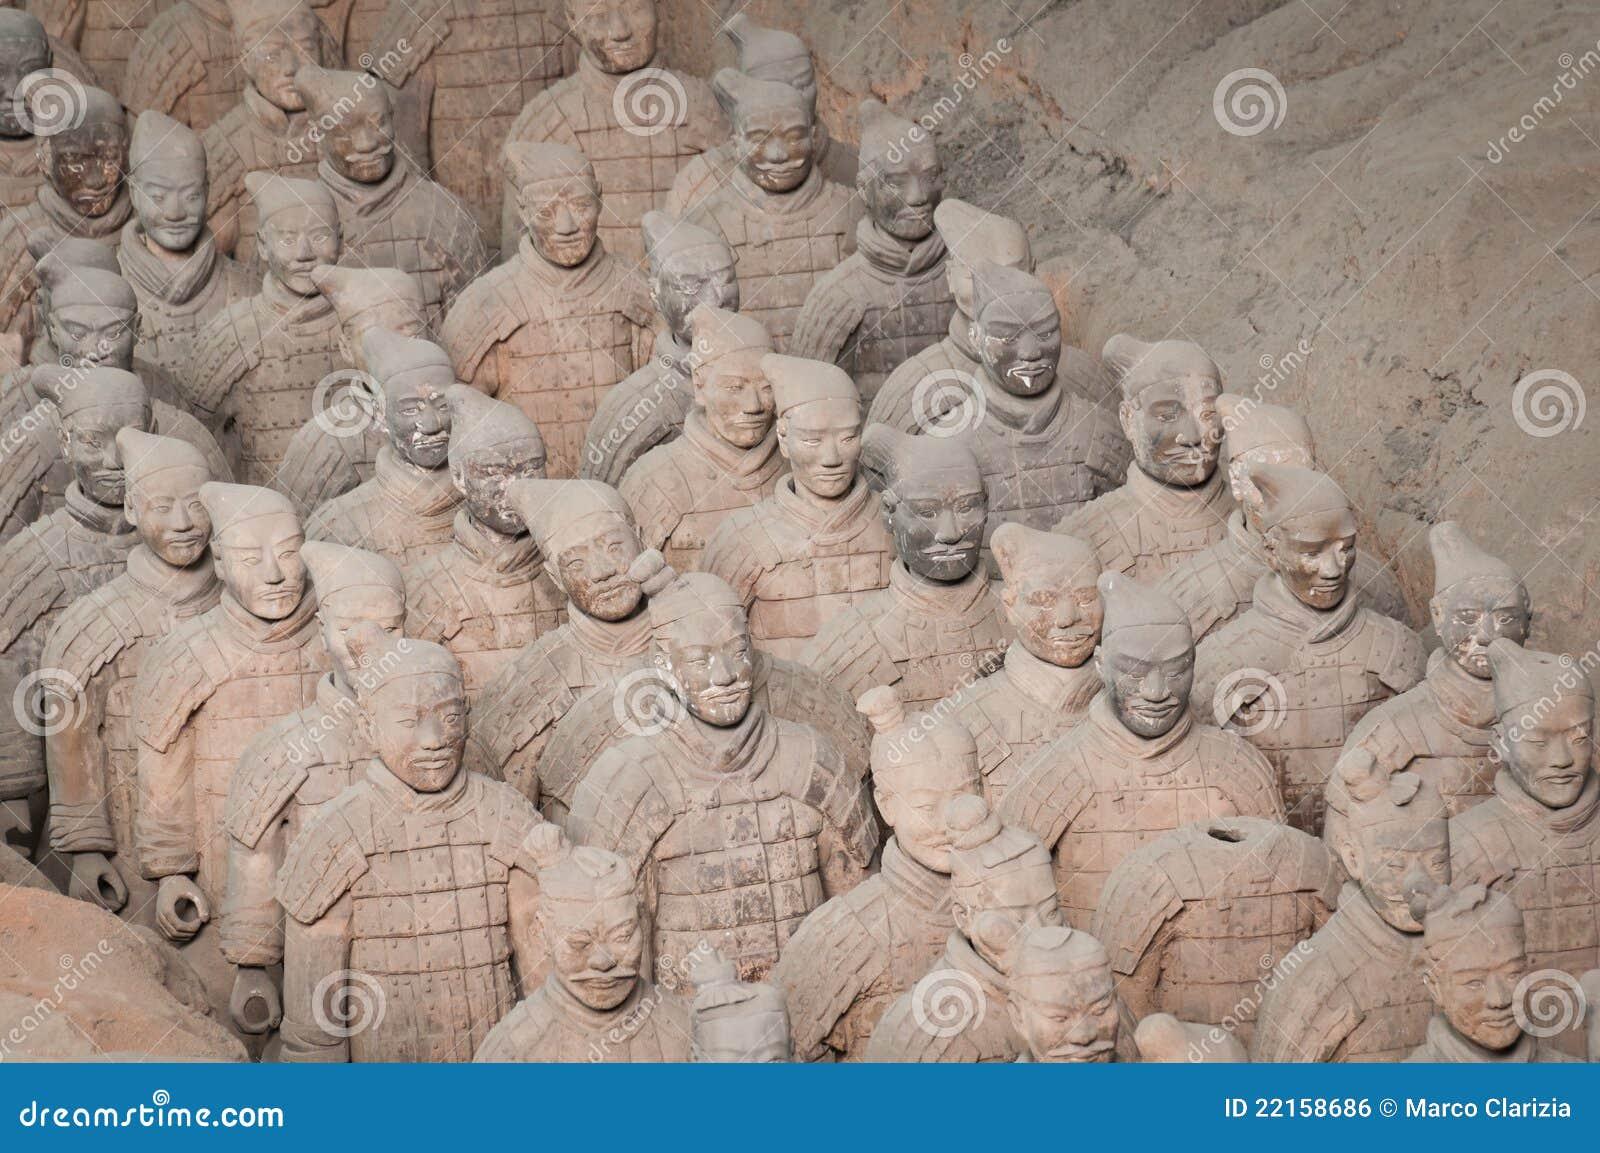 Terracotta army #2